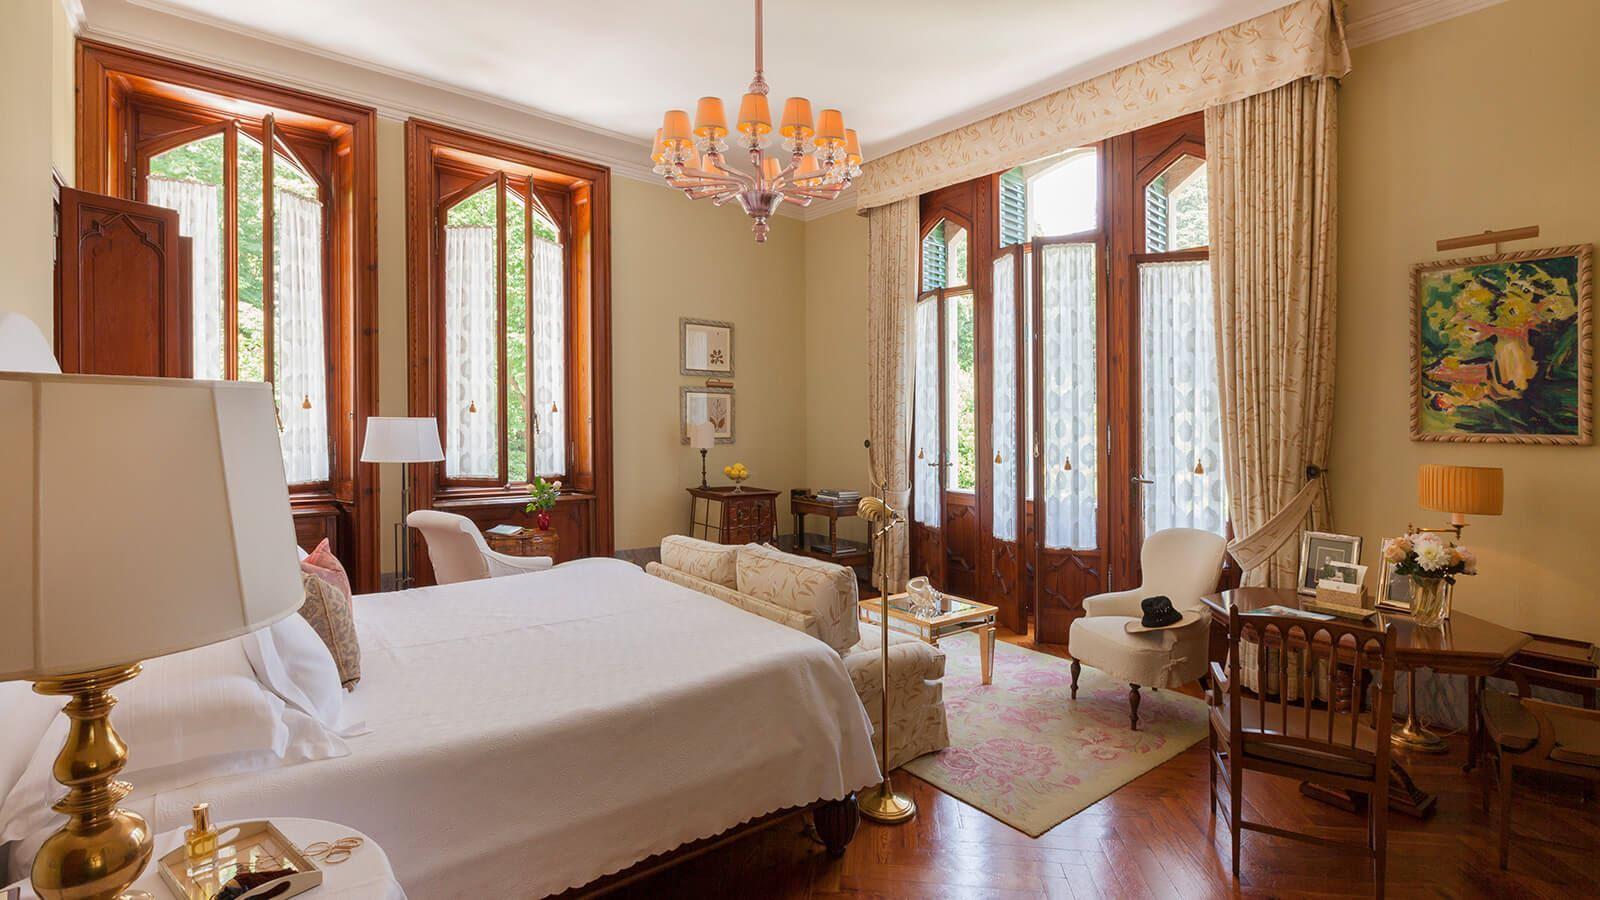 Weekday Wanderlust | Places: Grand Hotel Villa Feltrinelli, Part 2